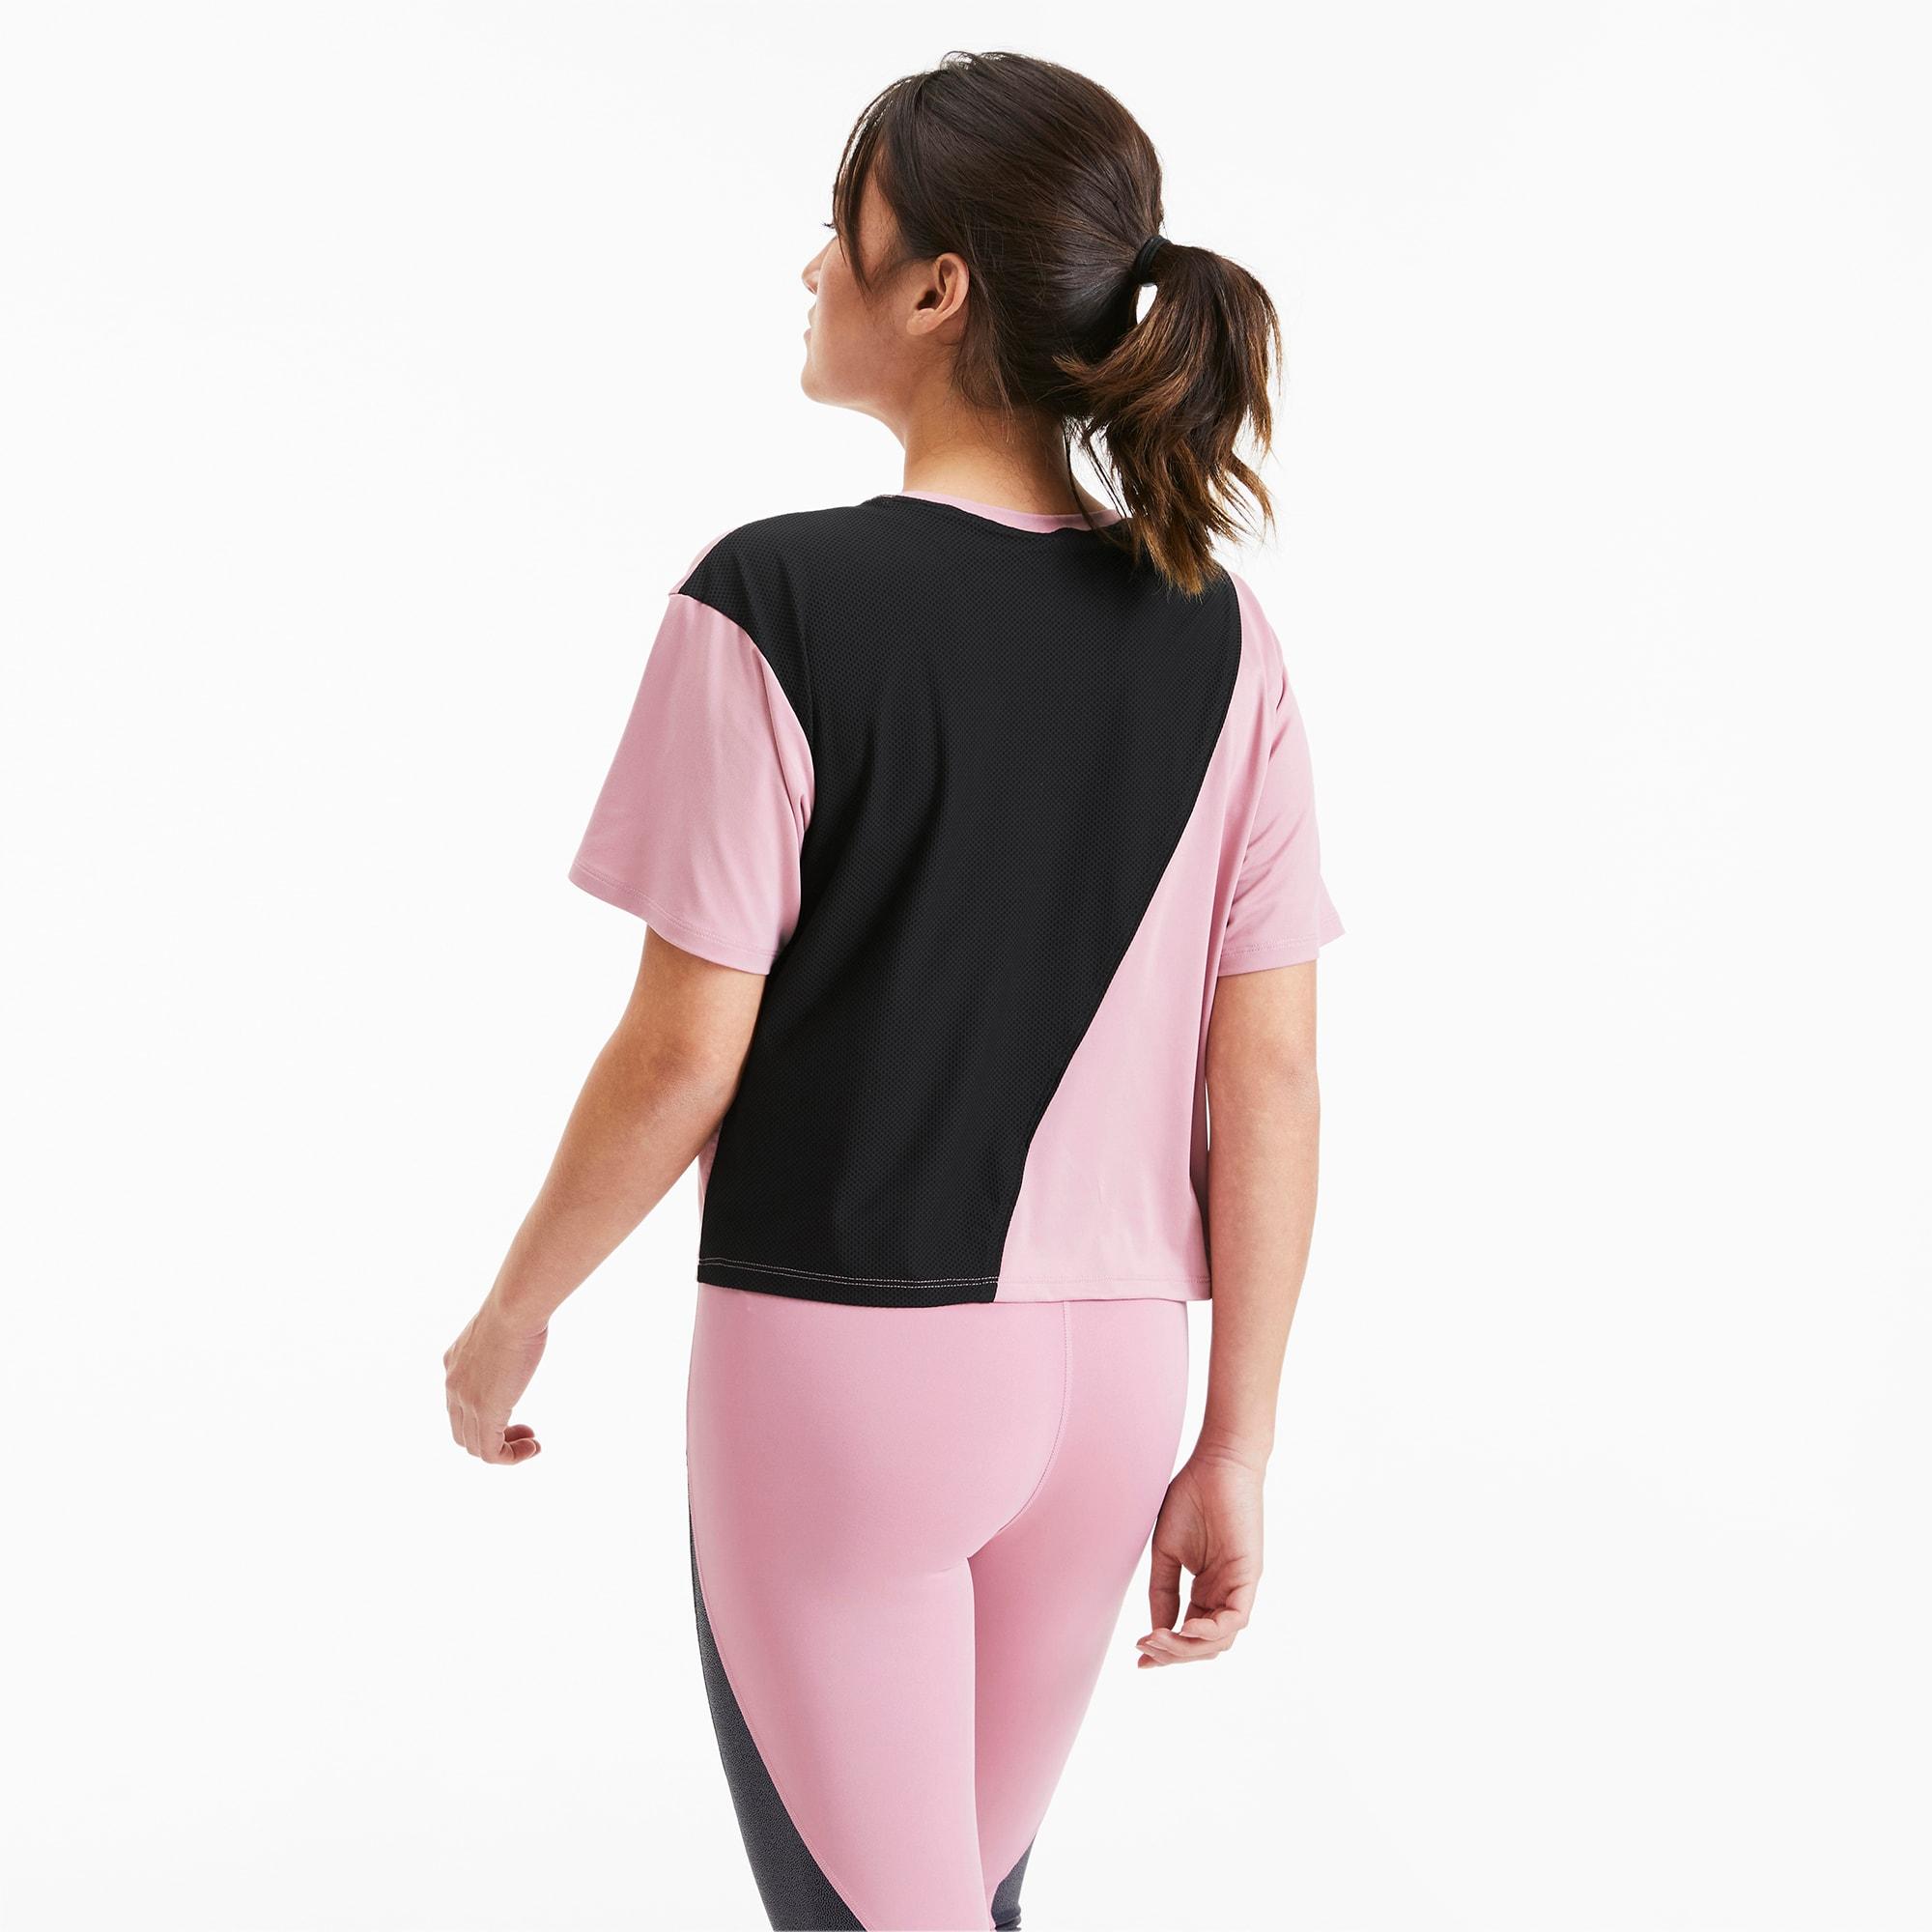 puma -  Pearl Damen Trainings-T-Shirt   Mit Aucun   Schwarz   Größe: XL